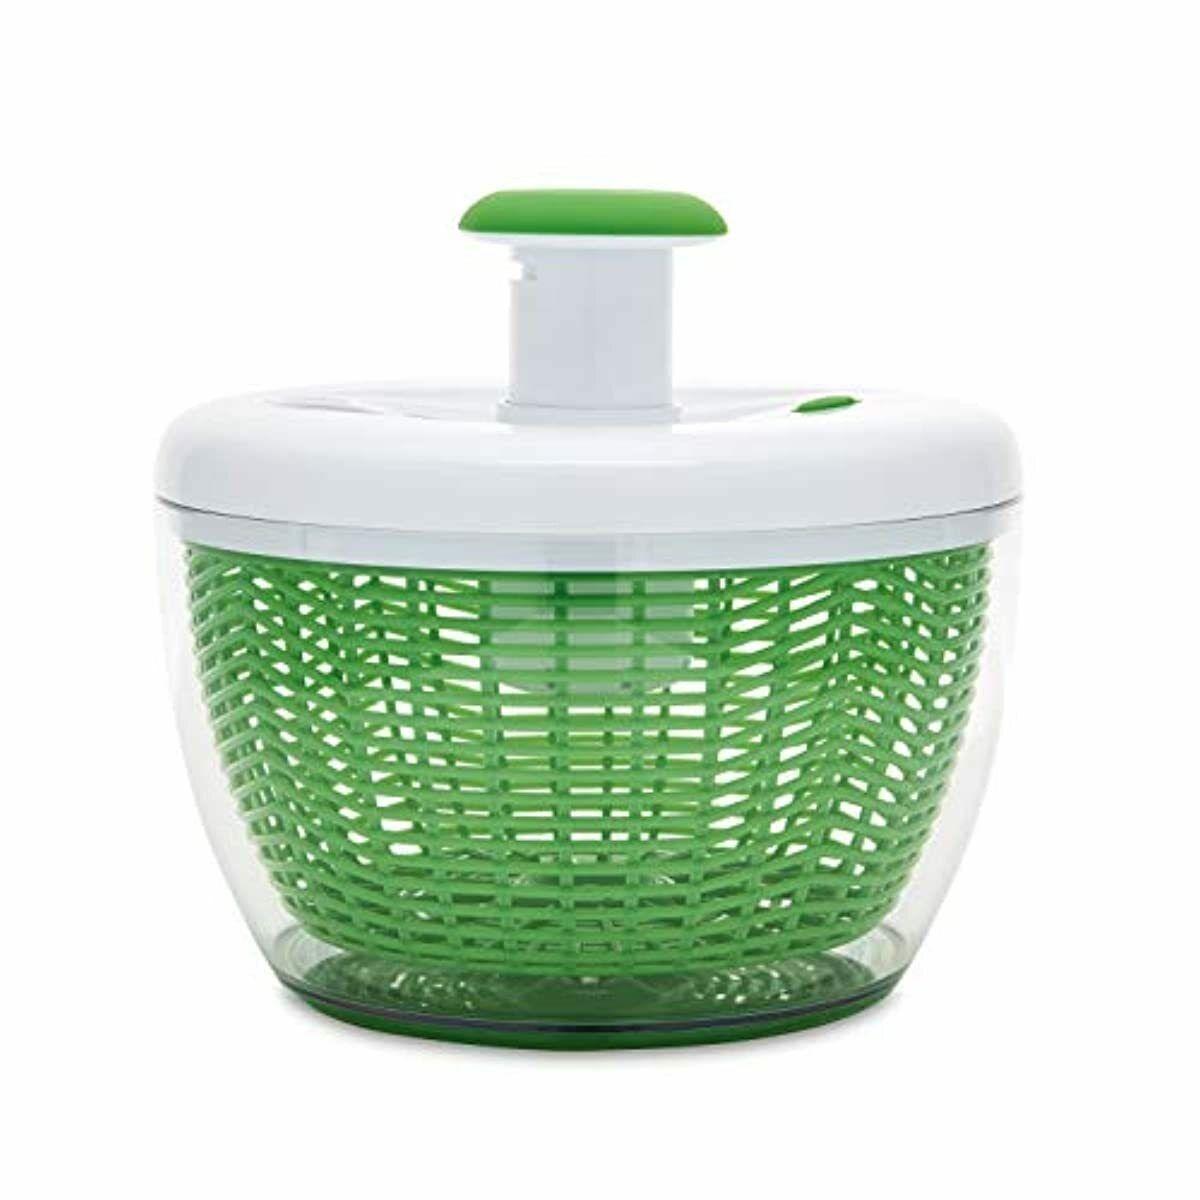 Farberware Pro Pump Salad Spinner, one size, Green